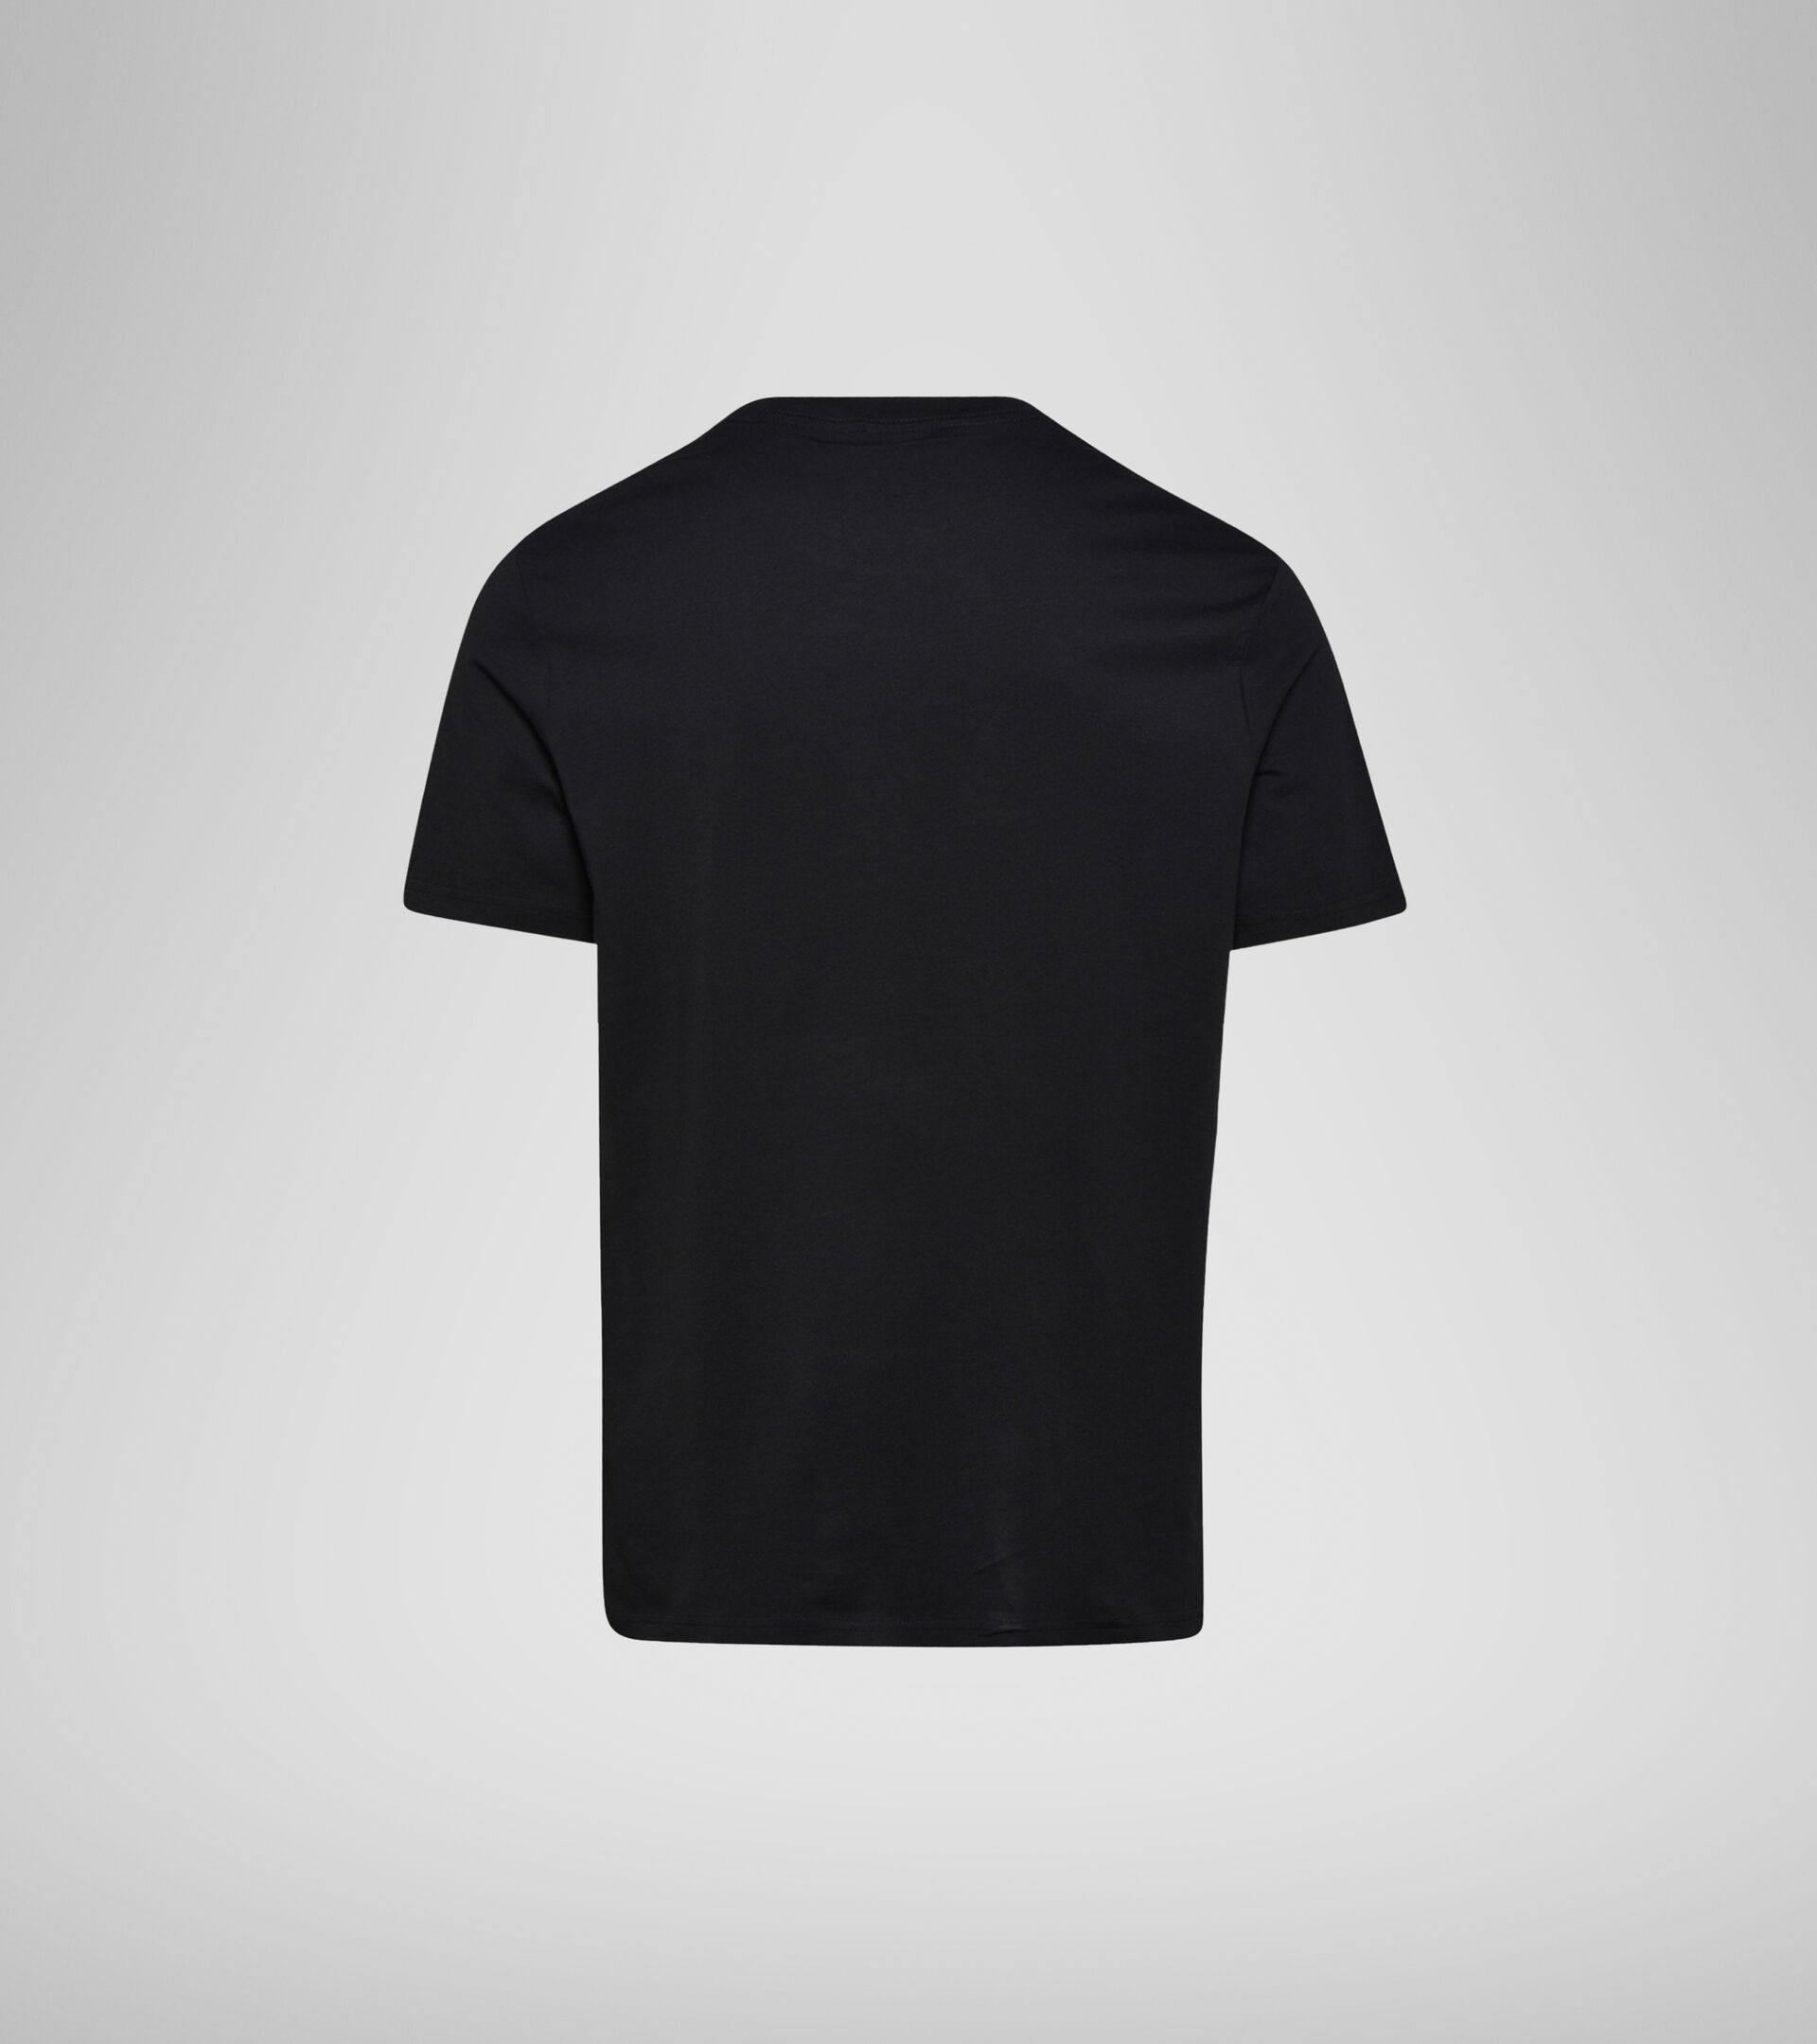 Apparel Sportswear UOMO SS T-SHIRT SPECTRA OC BLACK/WHITE MILK/ORANGEADE Diadora